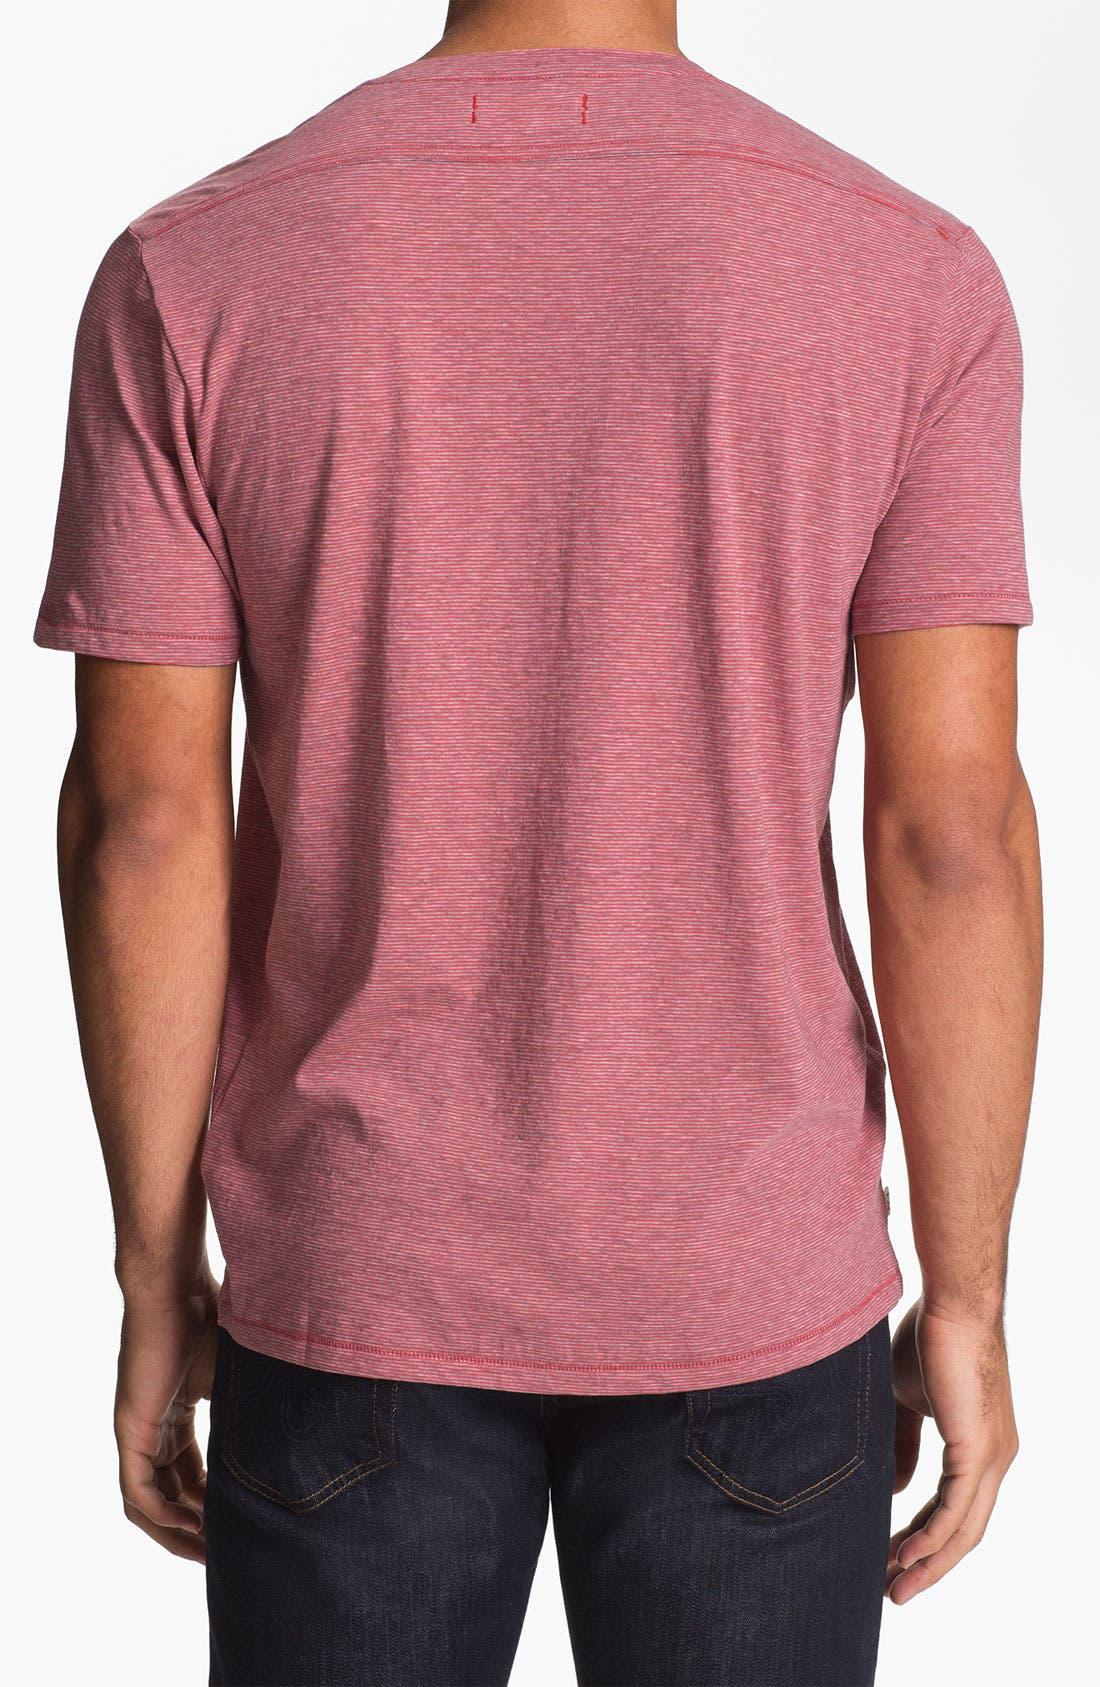 Alternate Image 2  - Cutter & Buck 'Vashon' V-Neck T-Shirt (Big & Tall)